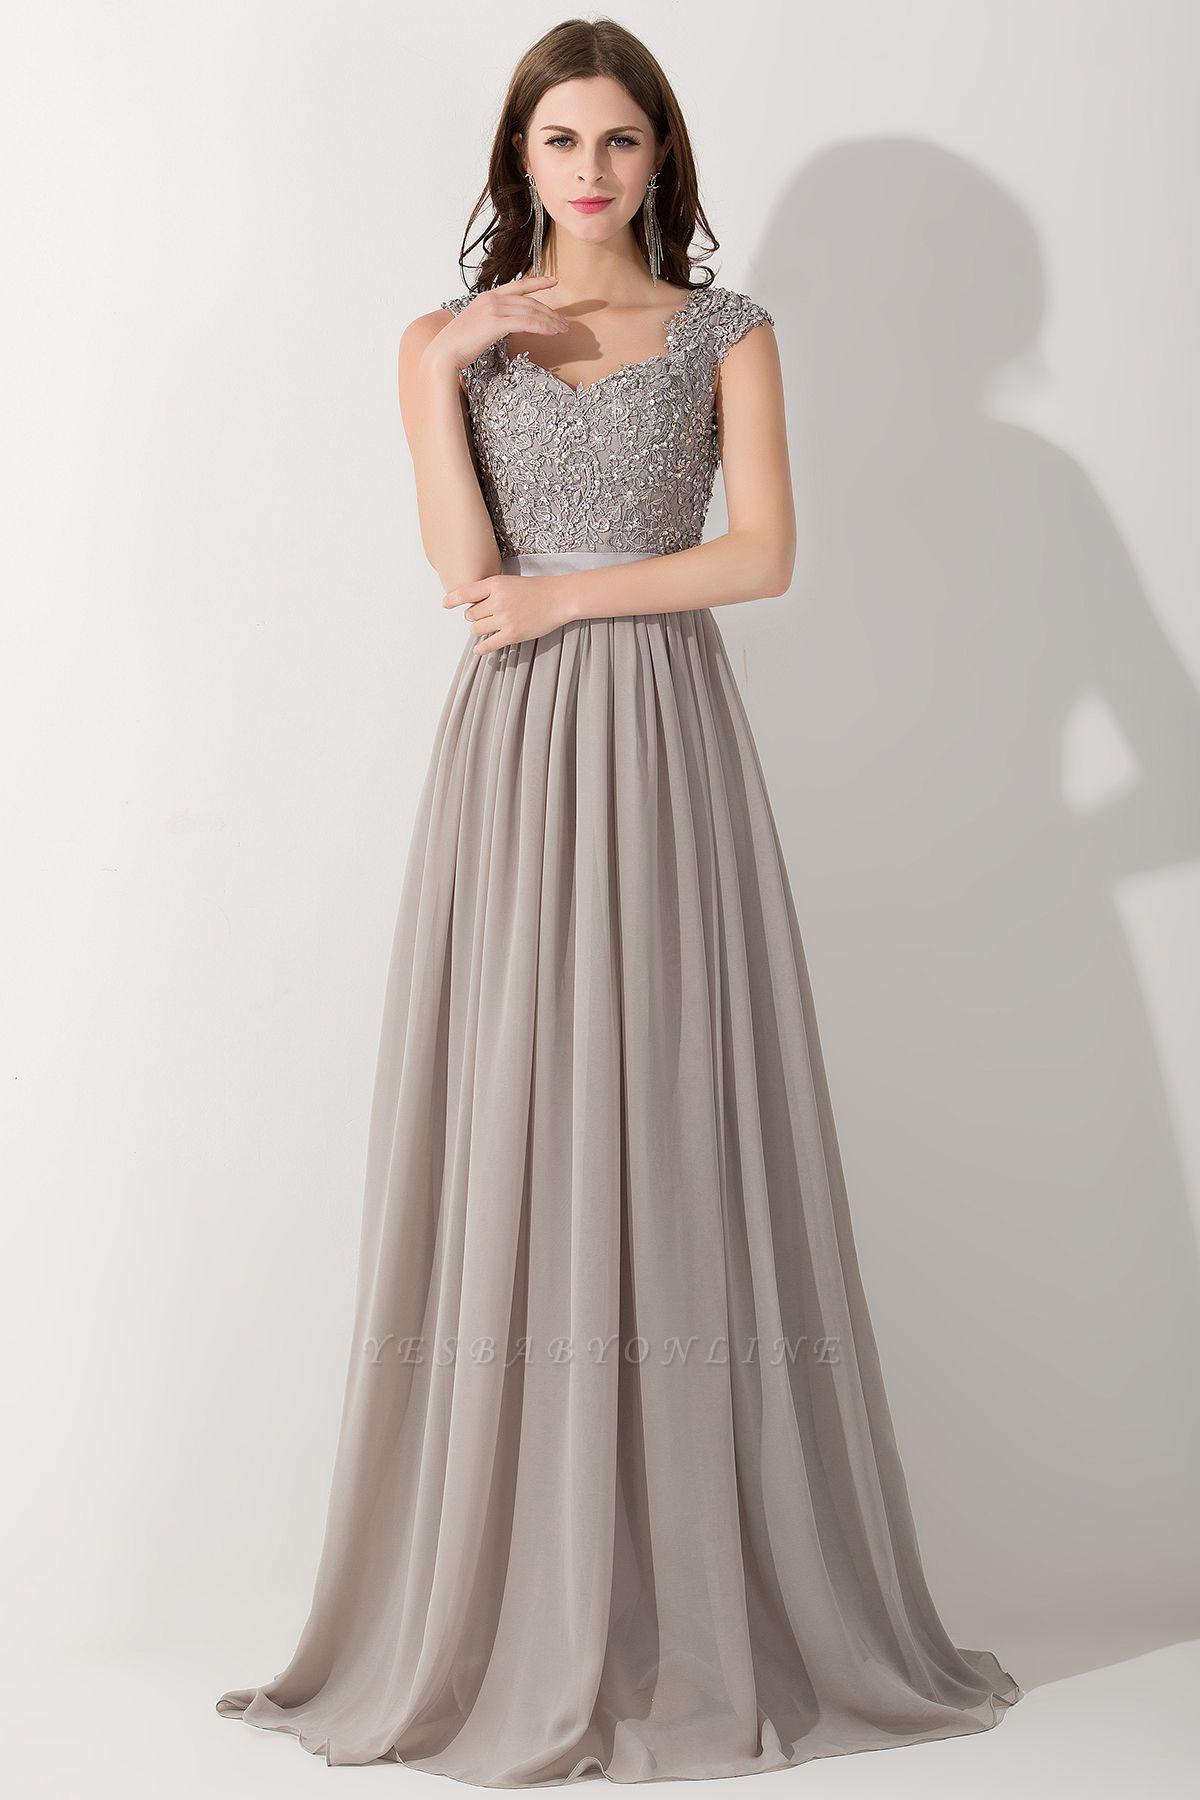 A-line  V-Neck Sleeveless Ruffles Floor-Length Bridesmaid Dress with Appliques